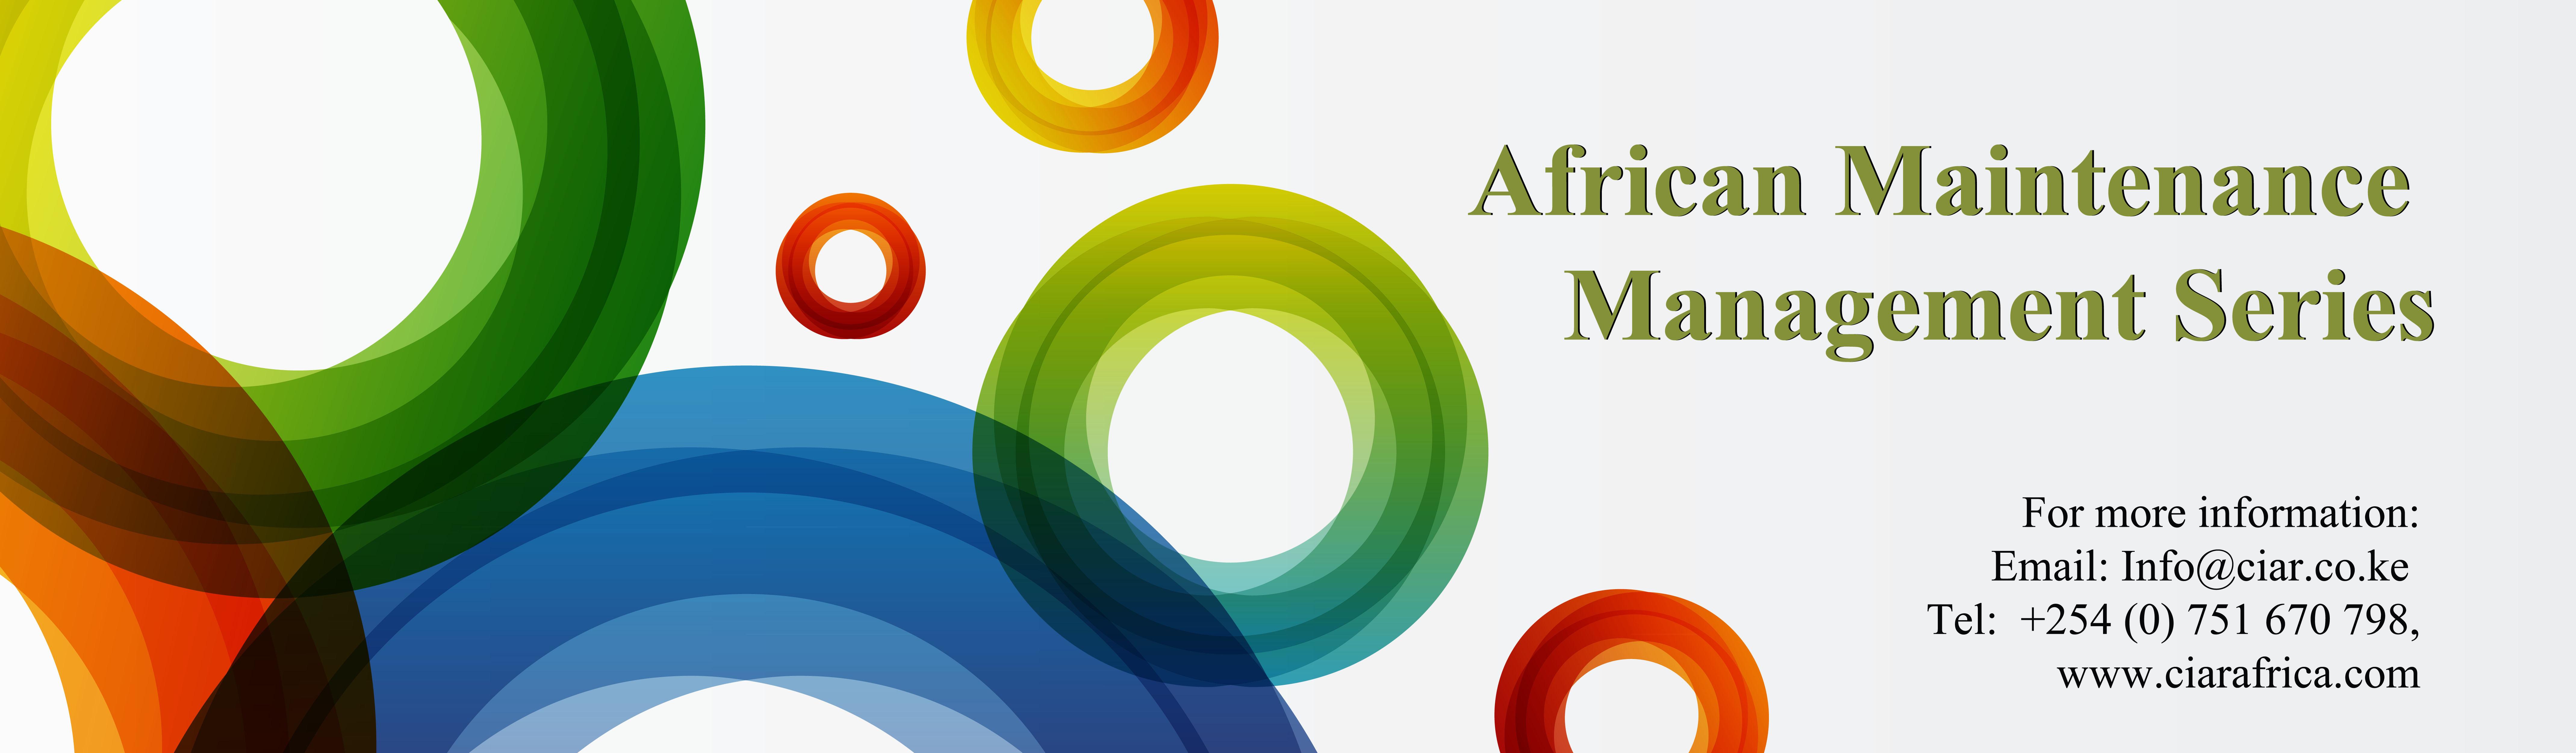 Africa Maintenance Management Series